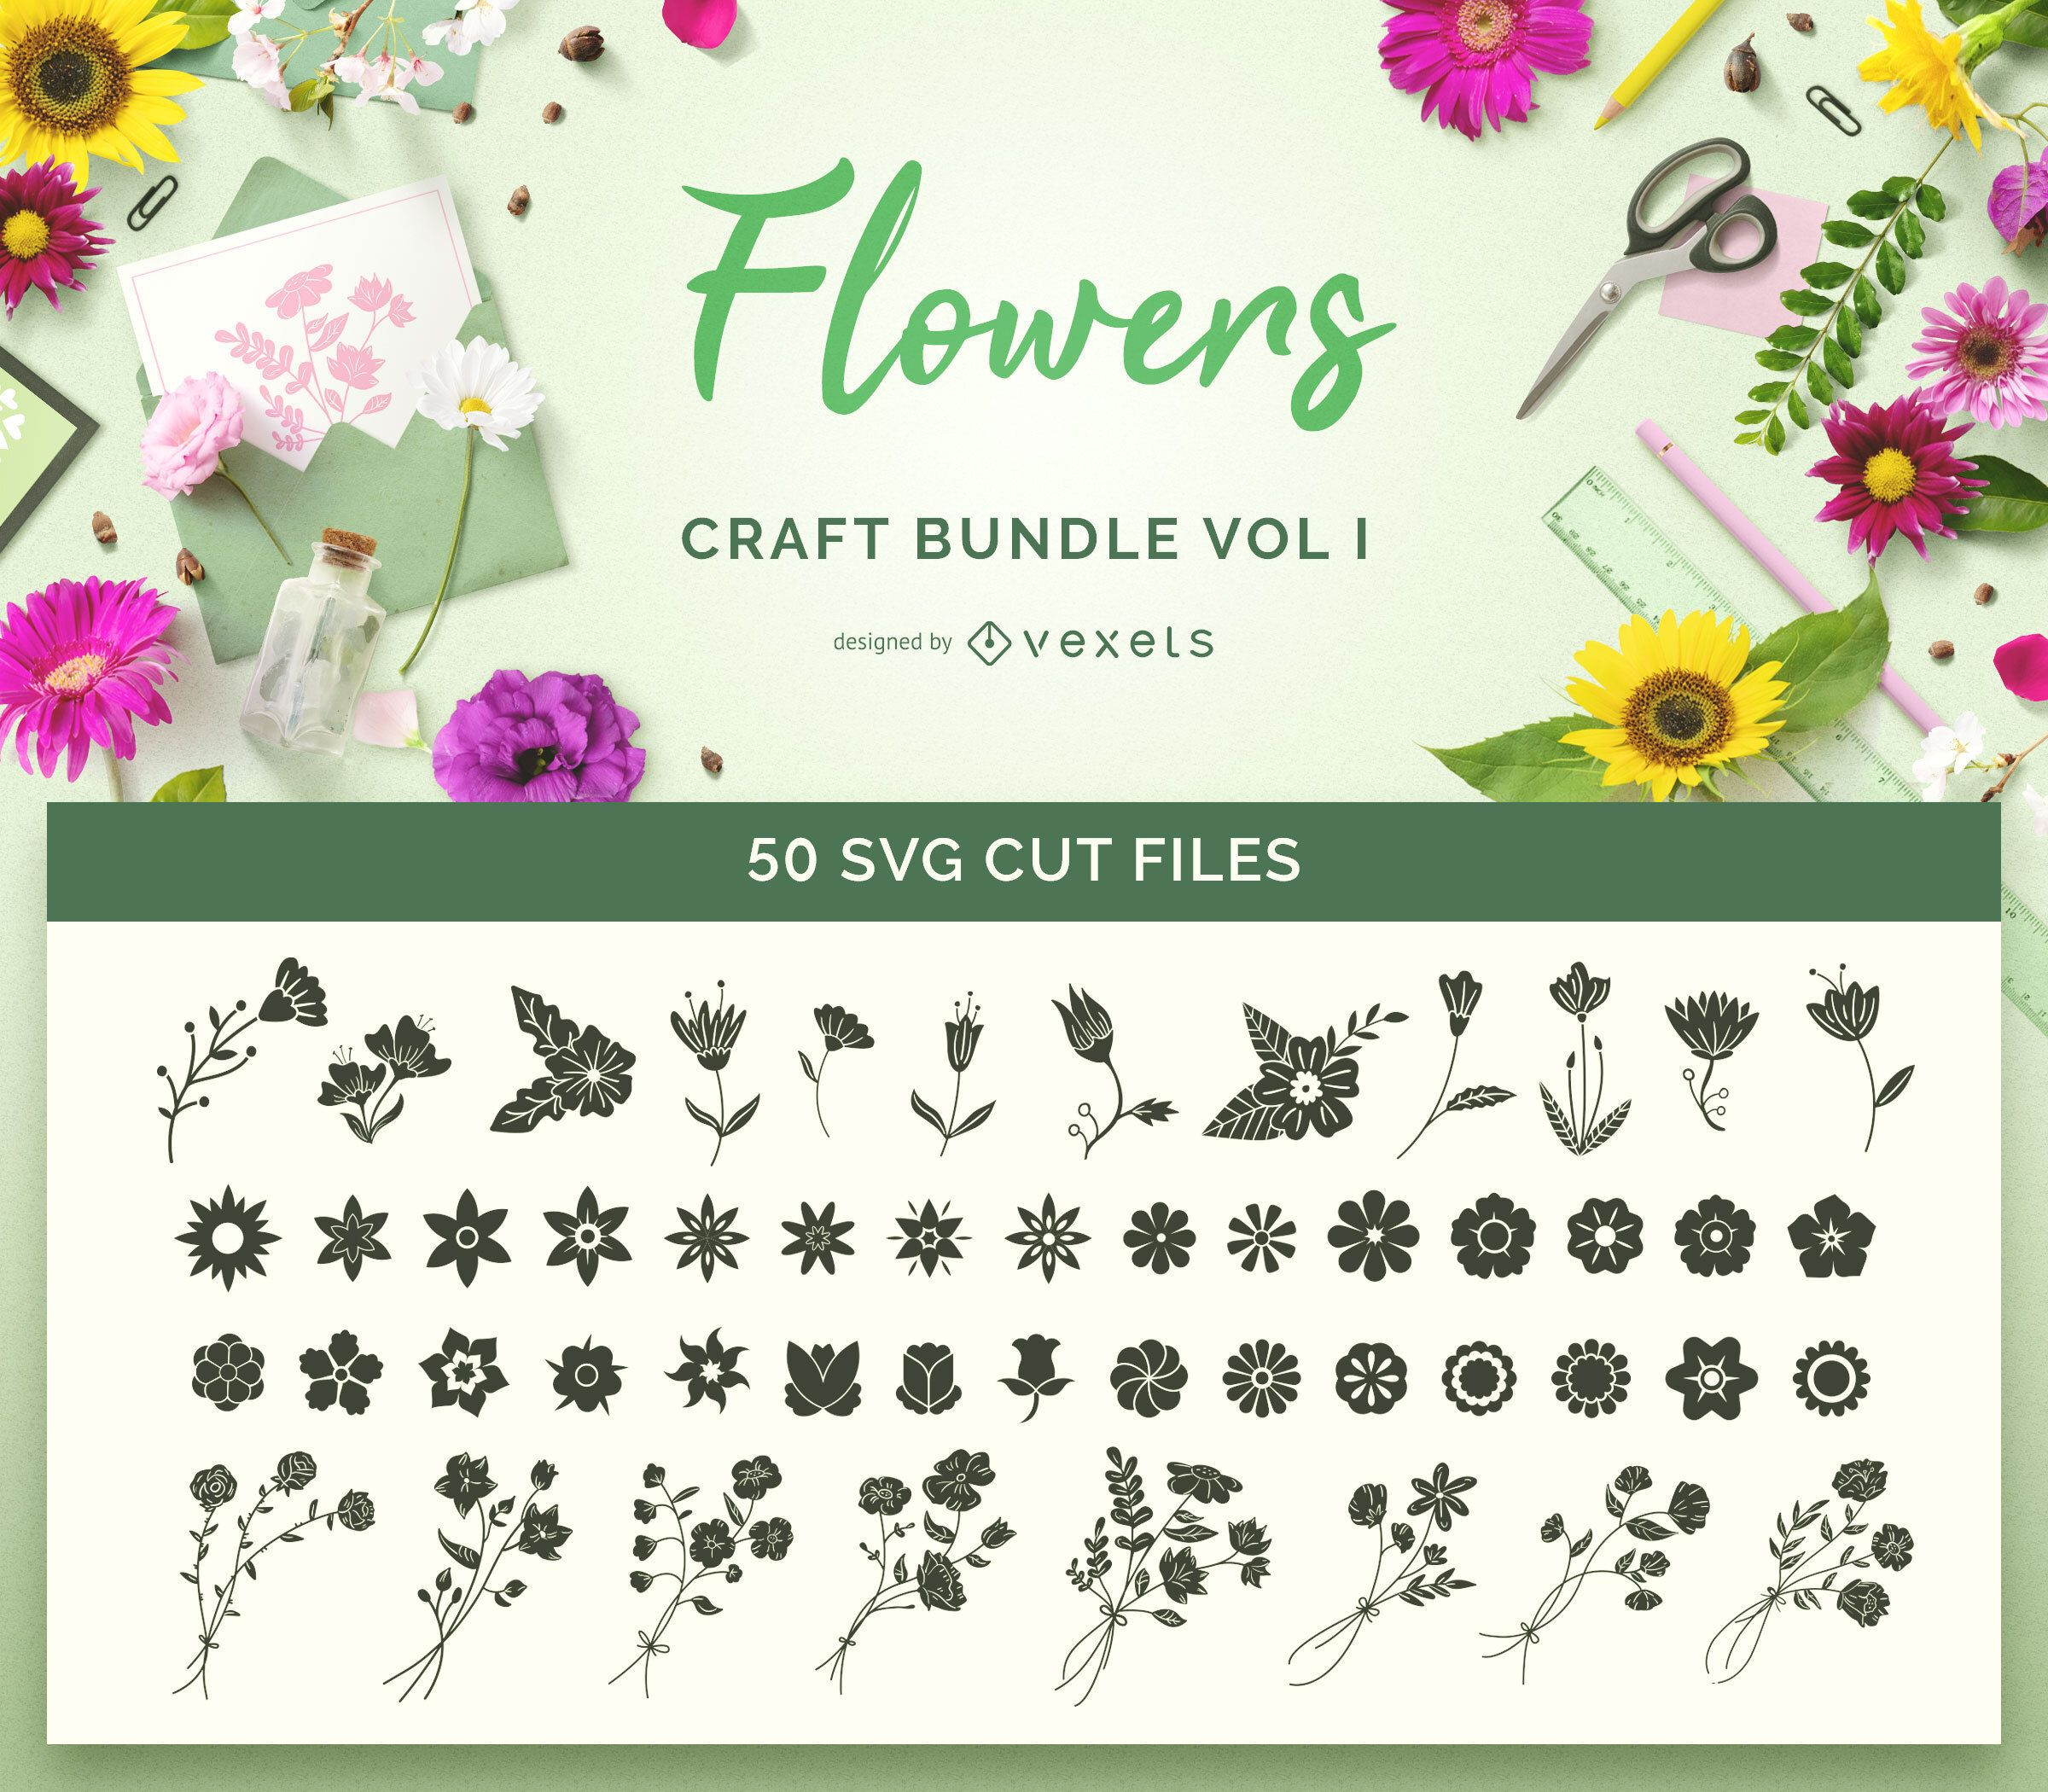 Flowers Craft SVG Bundle Vol I